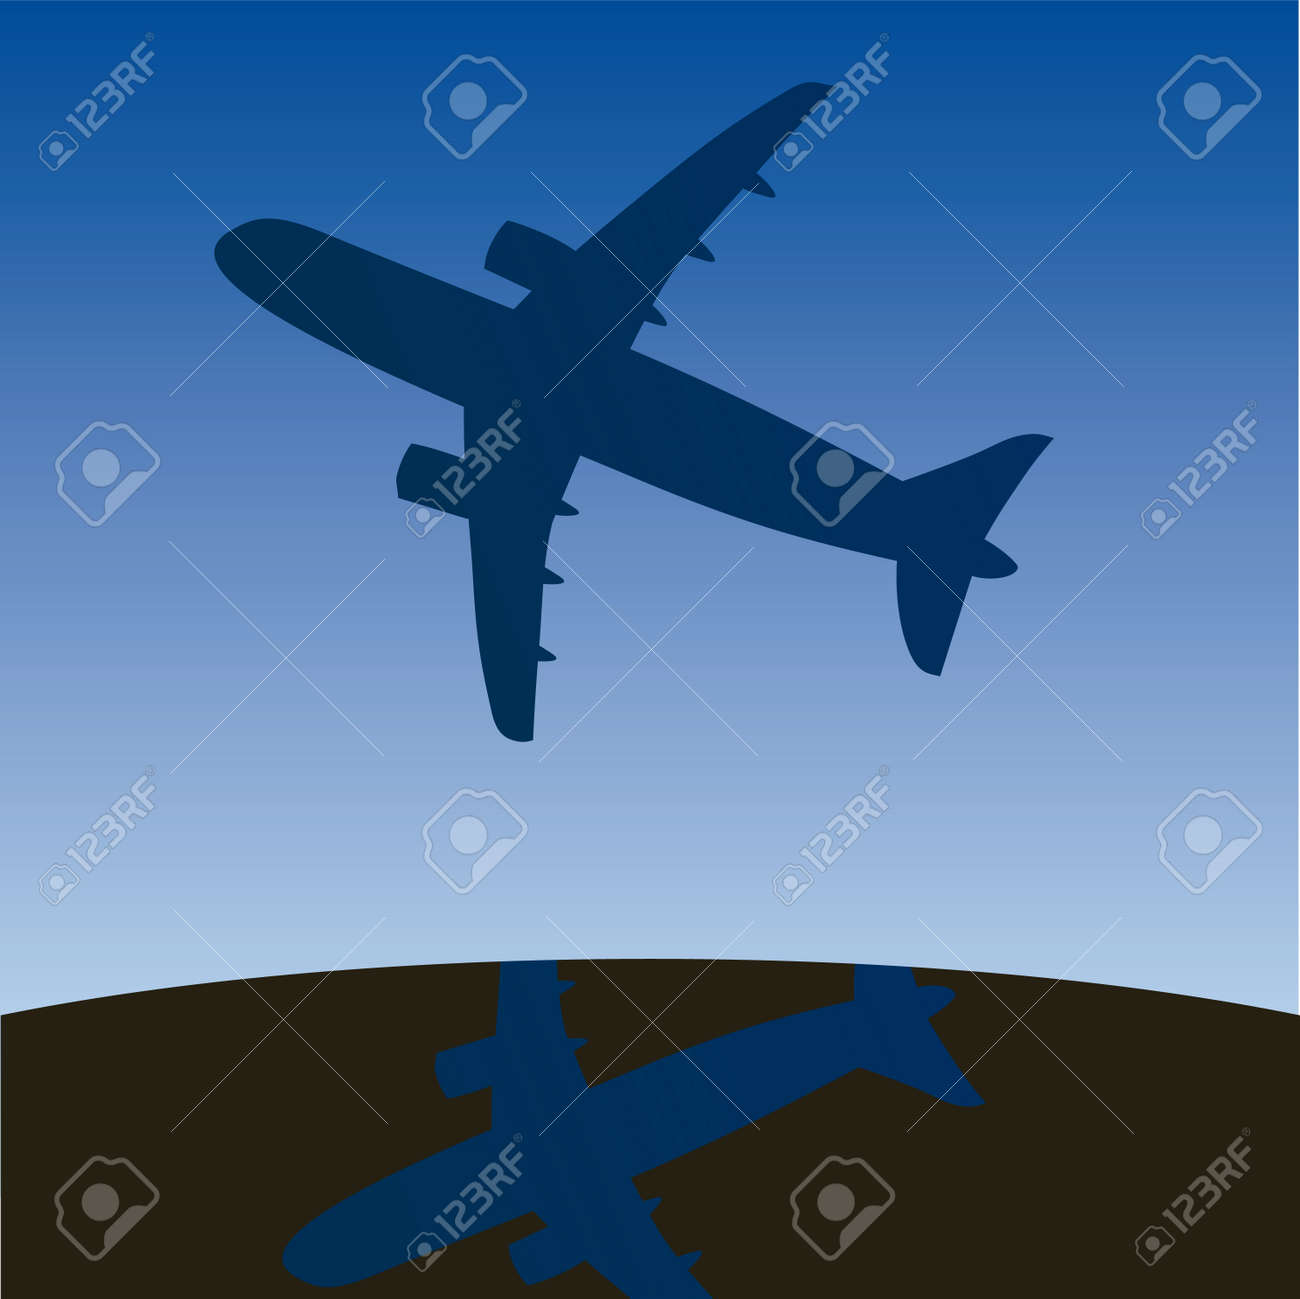 Airplane aero aviation silhouette. cartoon illustration. Stock Vector - 6860213